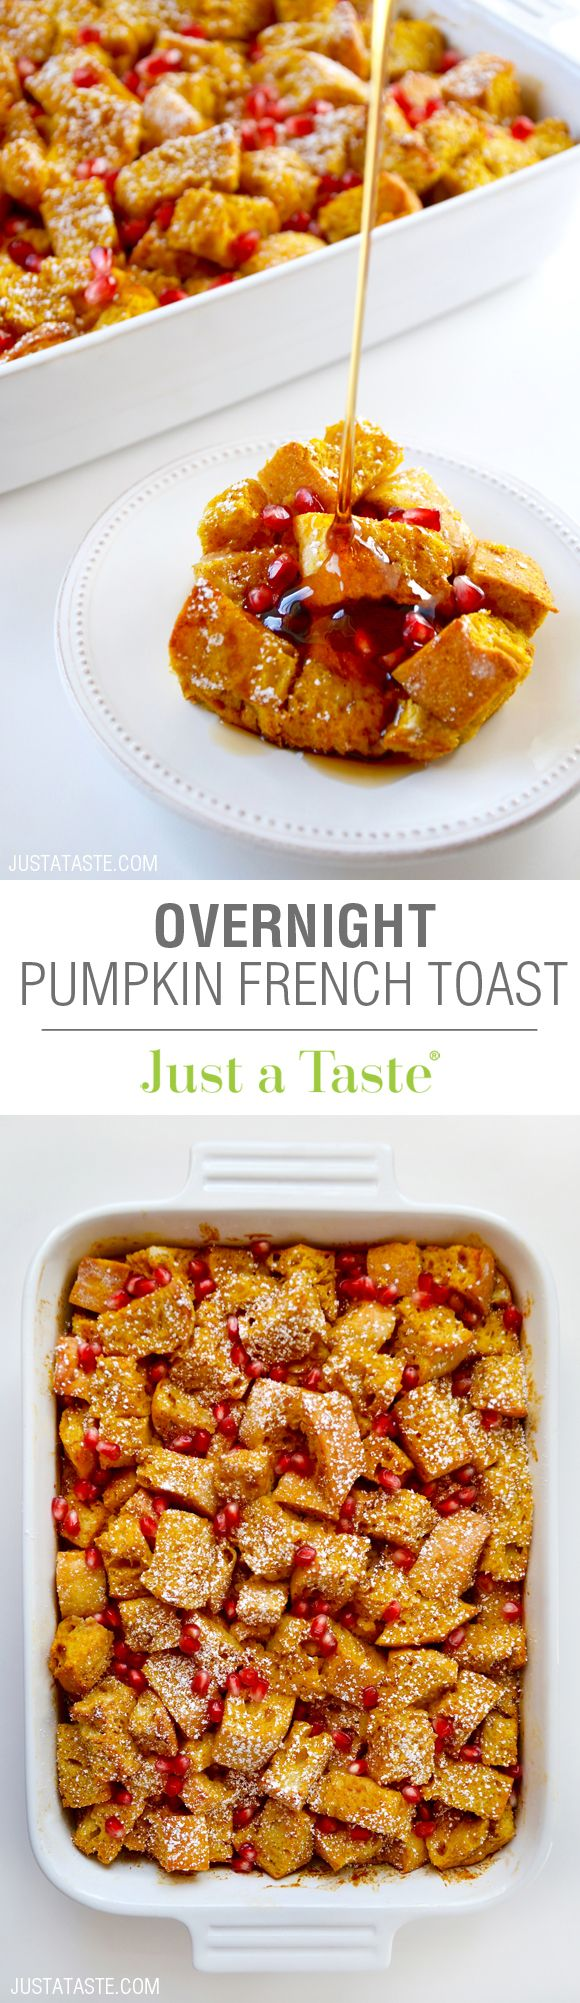 Overnight Pumpkin French Toast Bake recipe via justataste.com